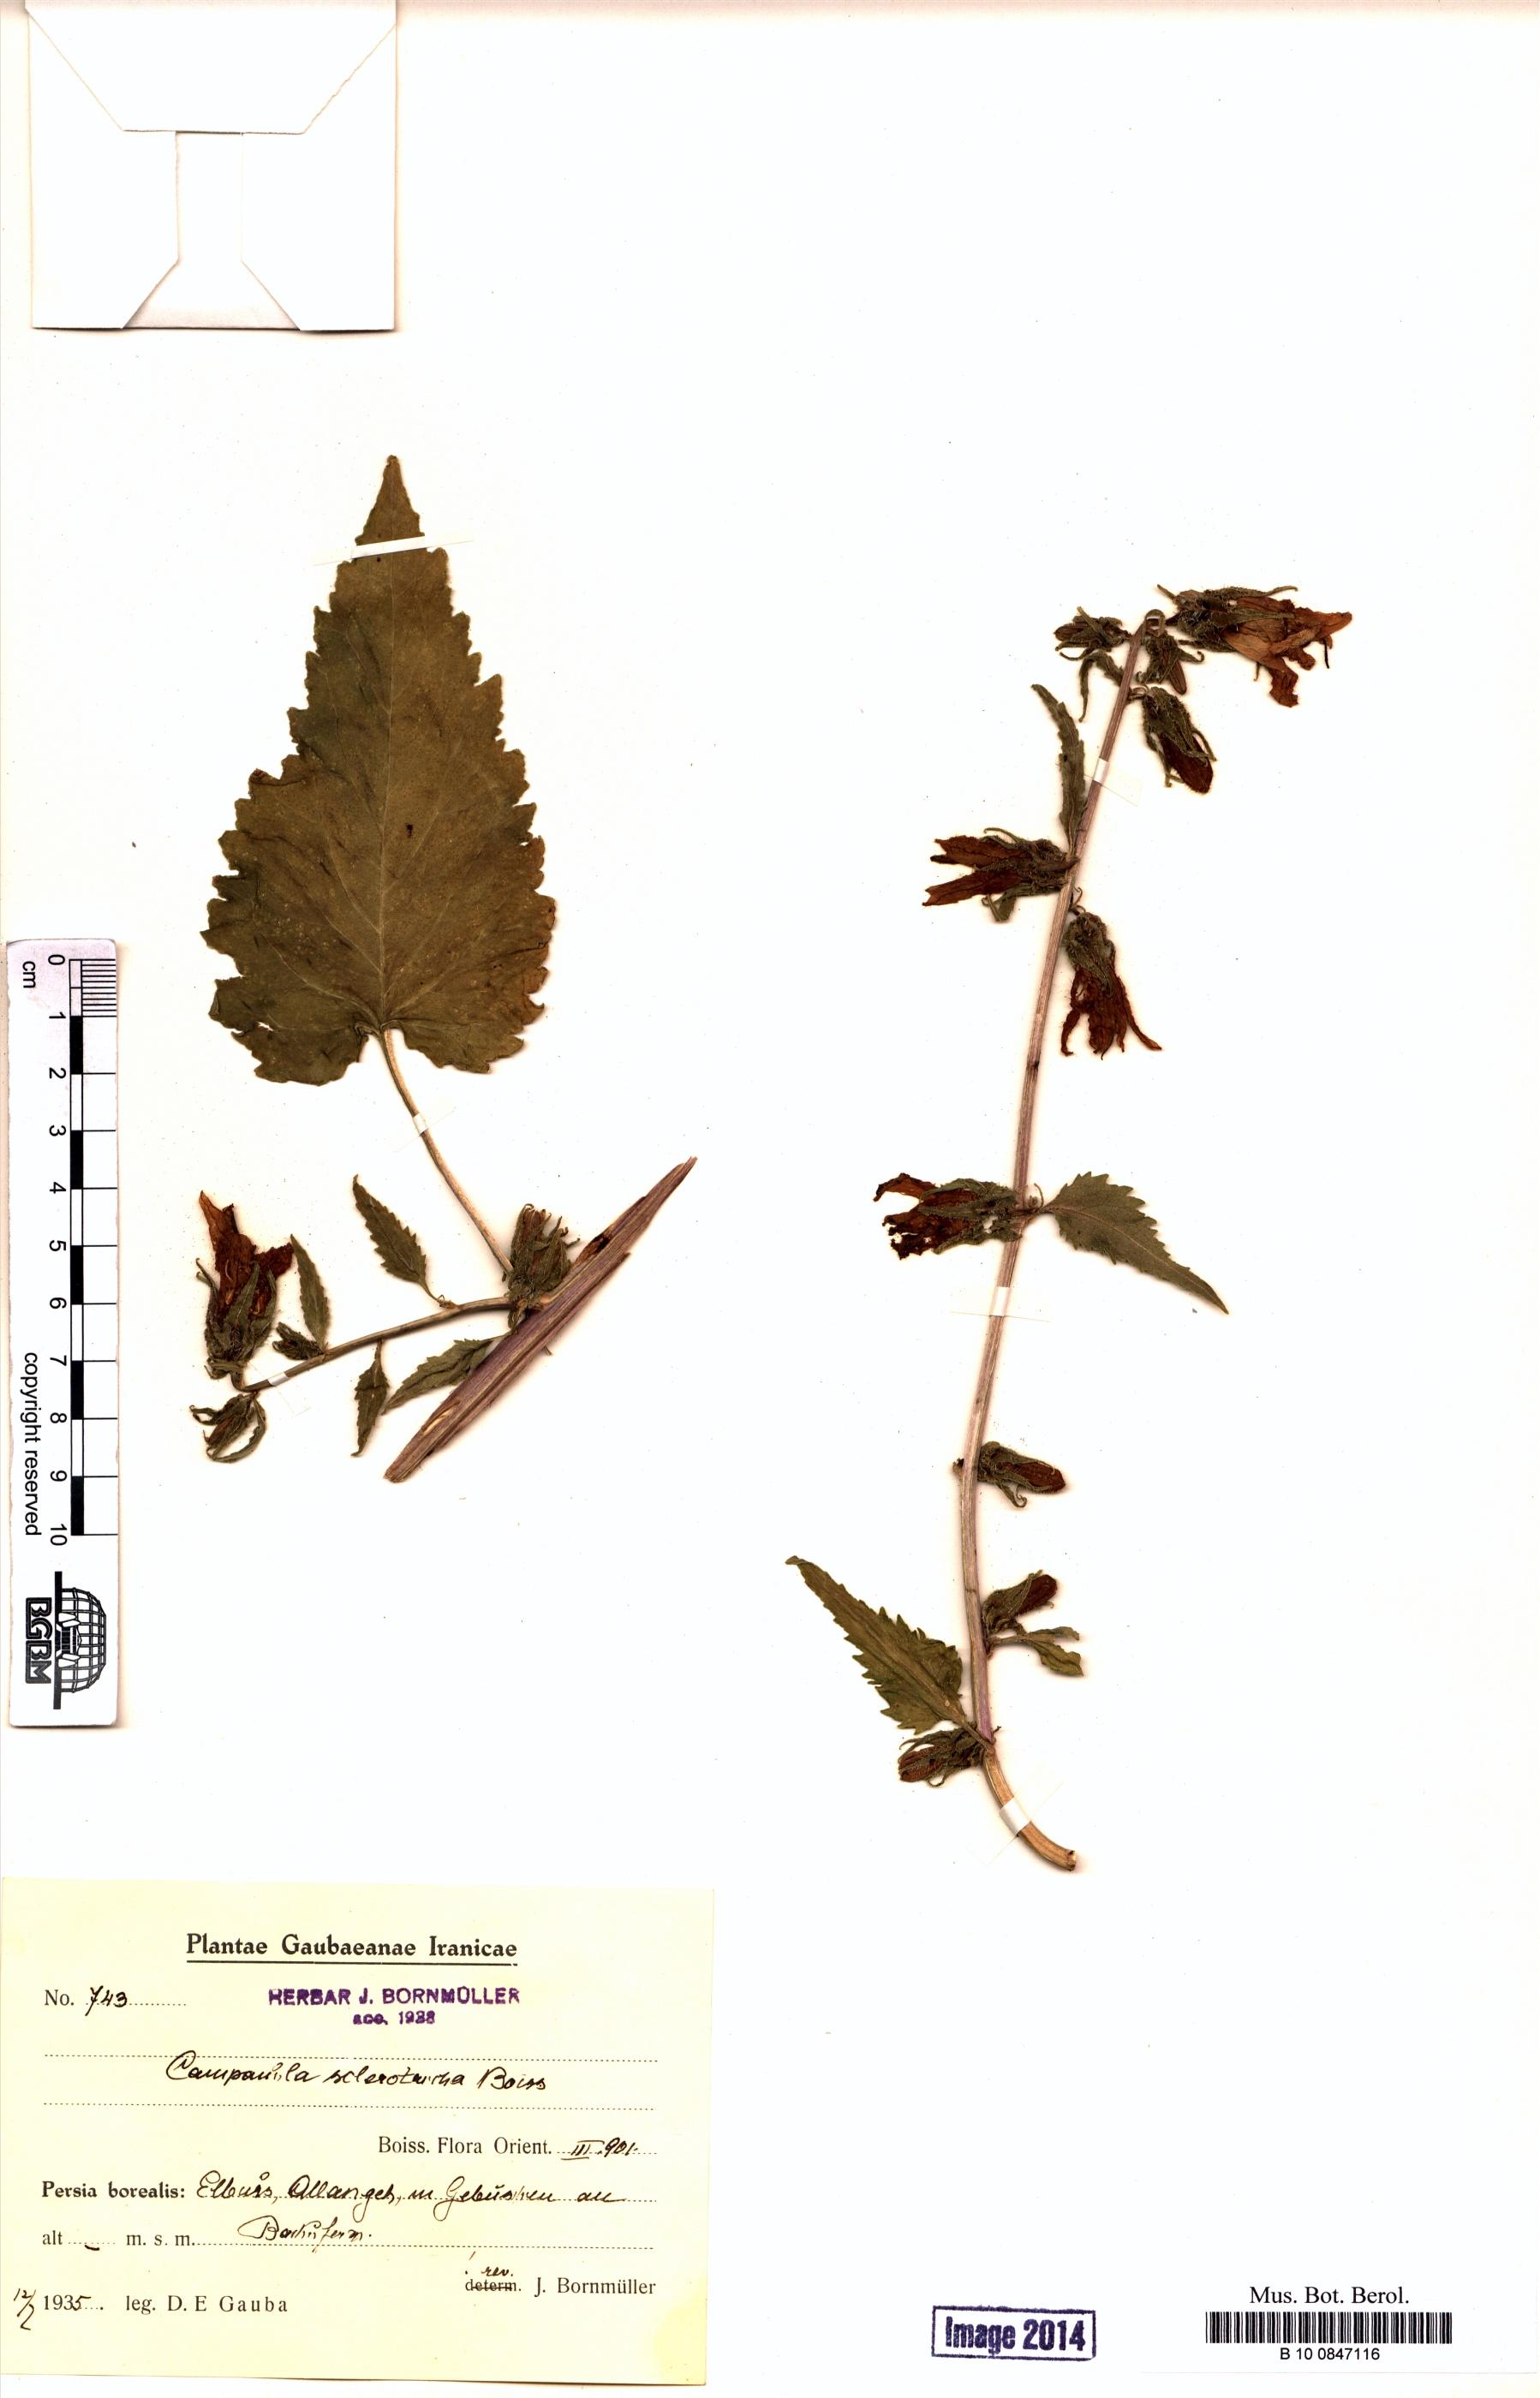 http://ww2.bgbm.org/herbarium/images/B/10/08/47/11/B_10_0847116.jpg